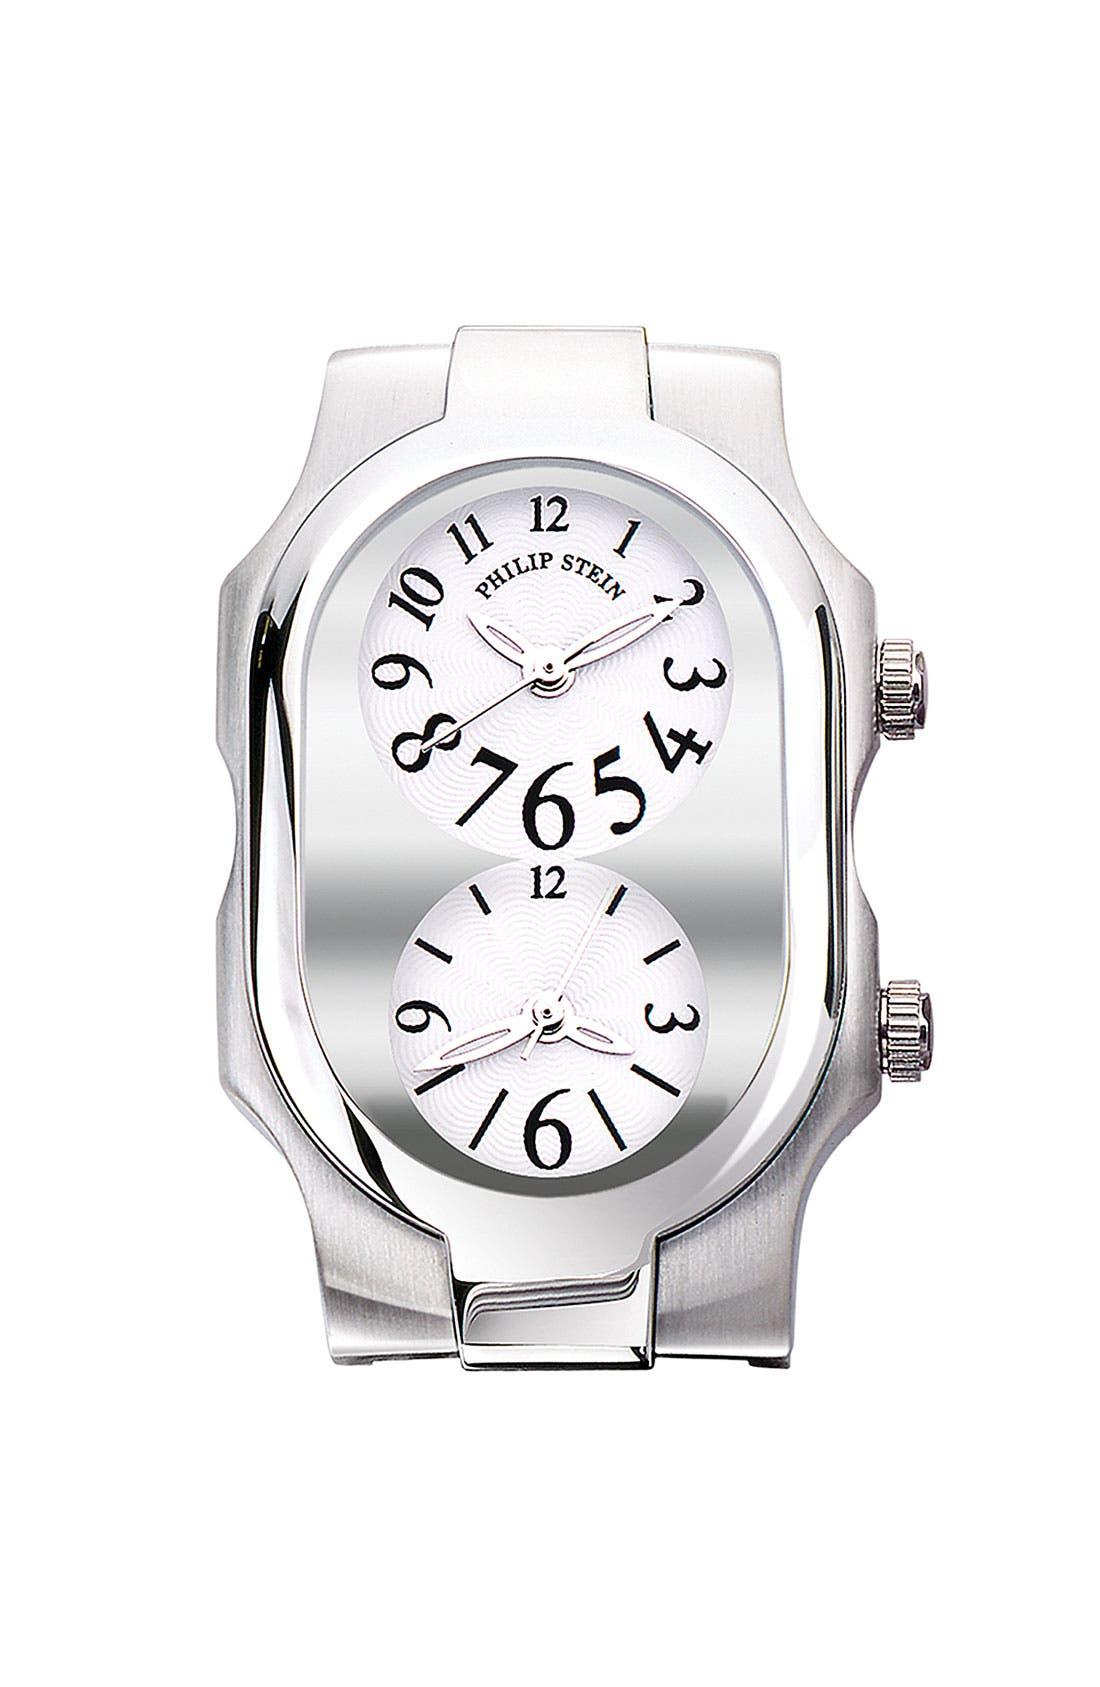 Main Image - Philip Stein® Ladies' 'Signature' Small Watch Case